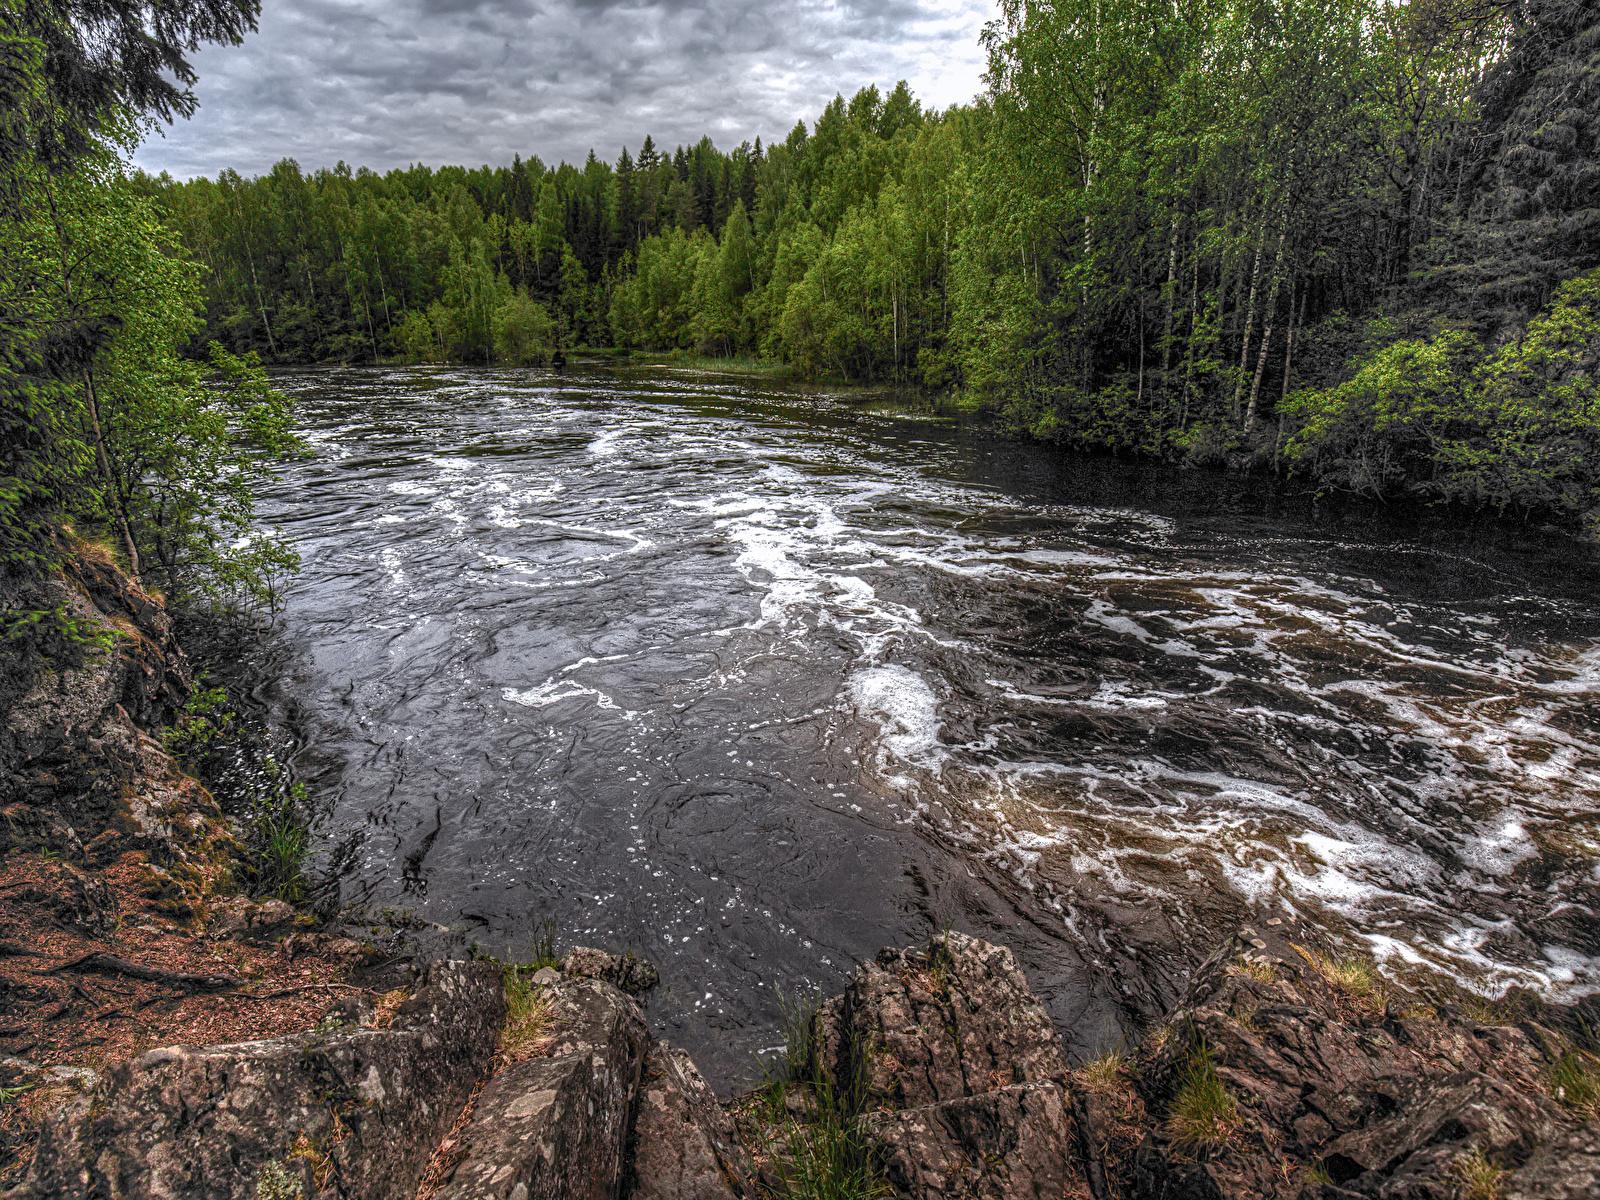 Картинки Россия Suna River Republic of Karelia Природа Леса Реки 1600x1200 речка